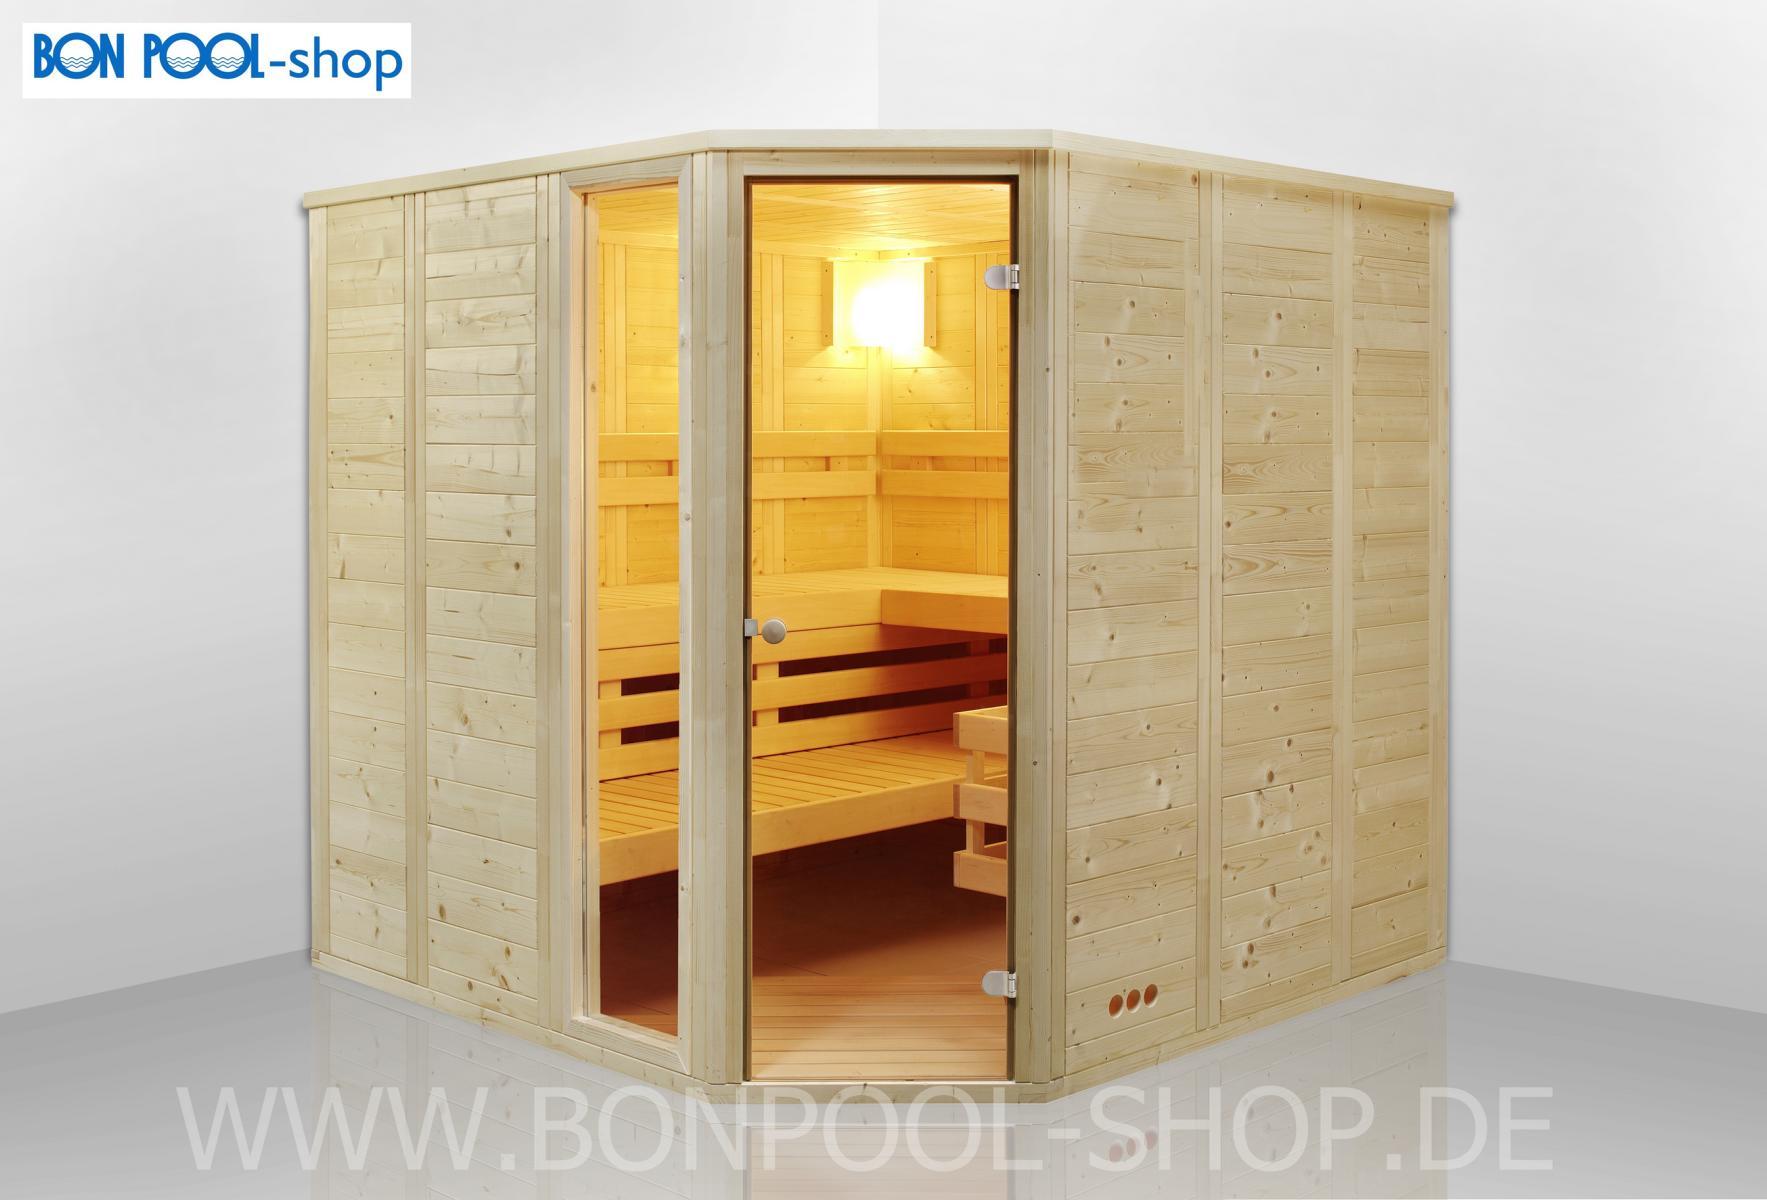 sauna topan komplett set fronteinstieg bon pool. Black Bedroom Furniture Sets. Home Design Ideas